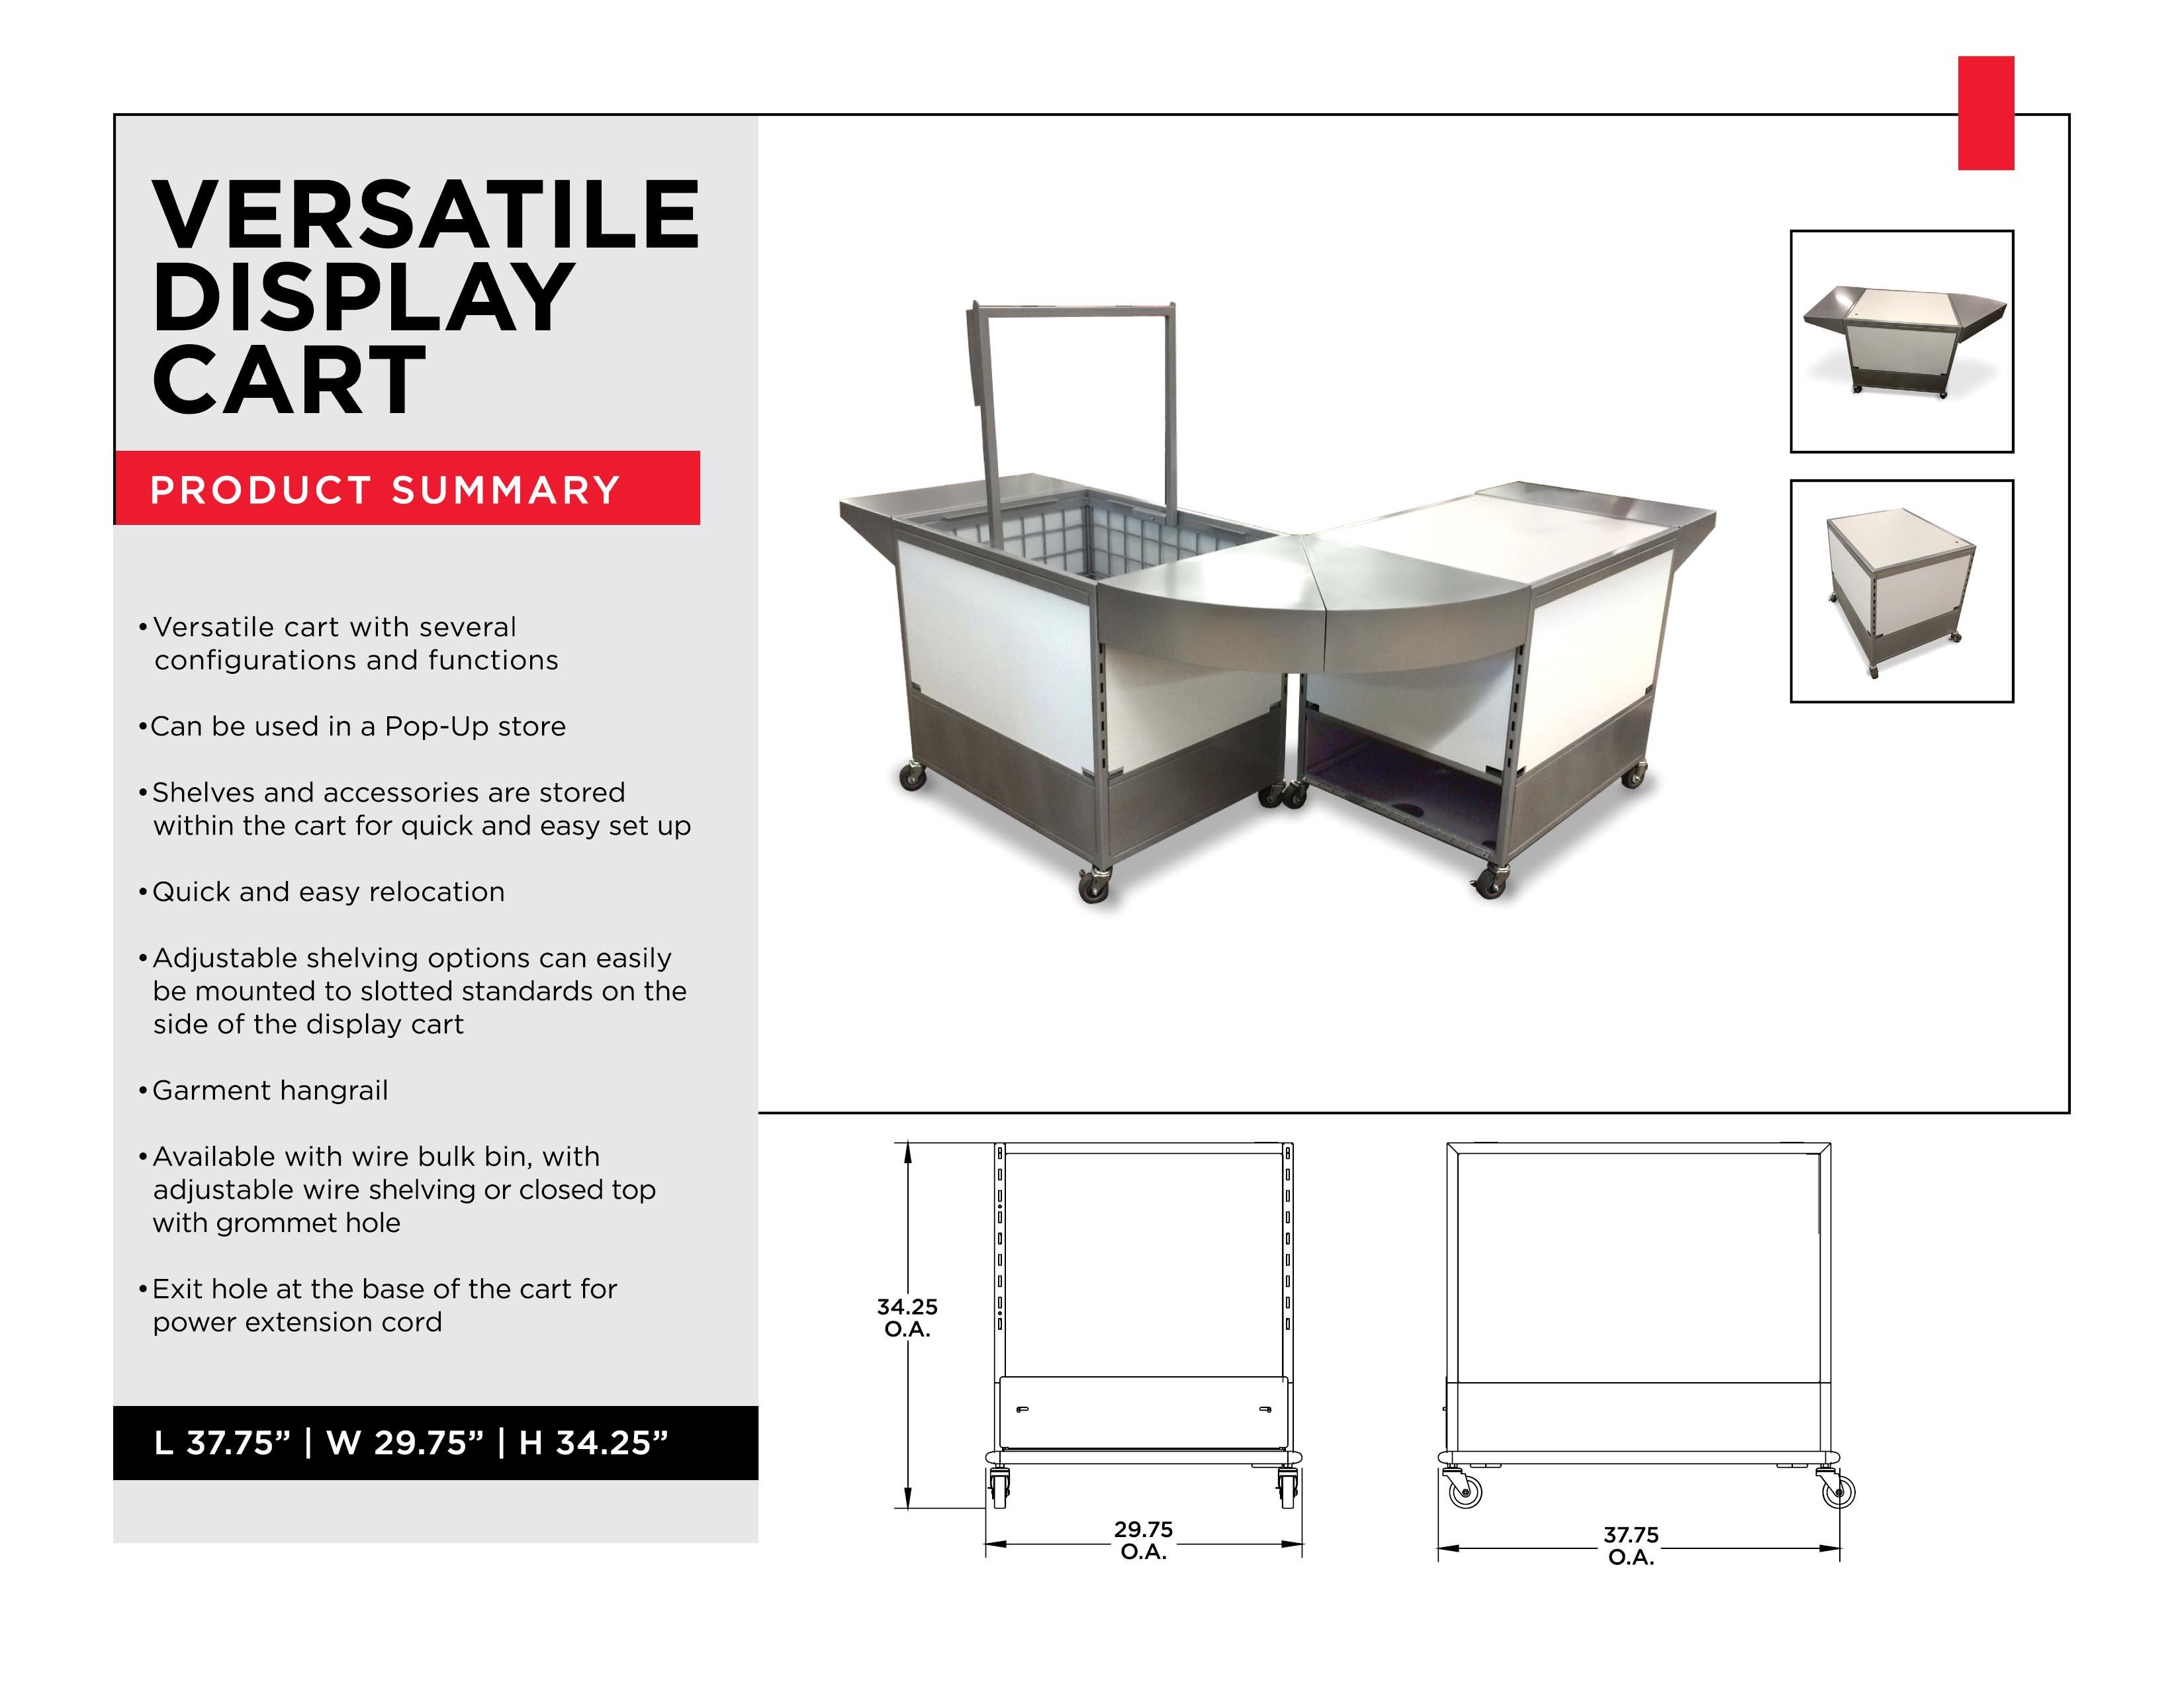 Retail Display Solutions: Versatile Display Cart